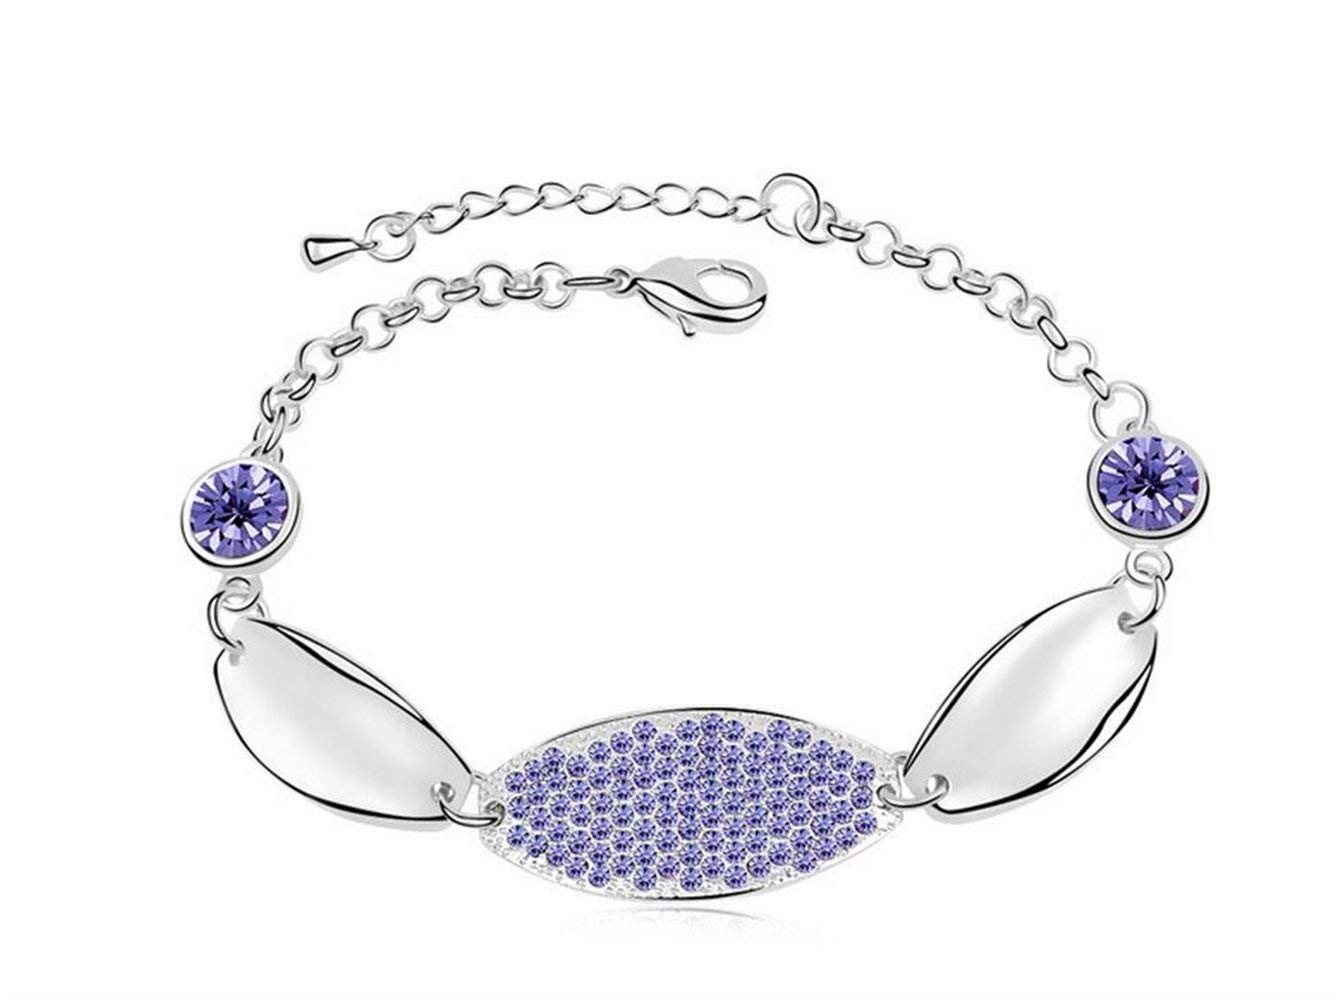 Women Elegant Leng Elegant Pretty Bracelet Extravagance Women's Austrian Crystal Adjustable Bracelet(Purple)